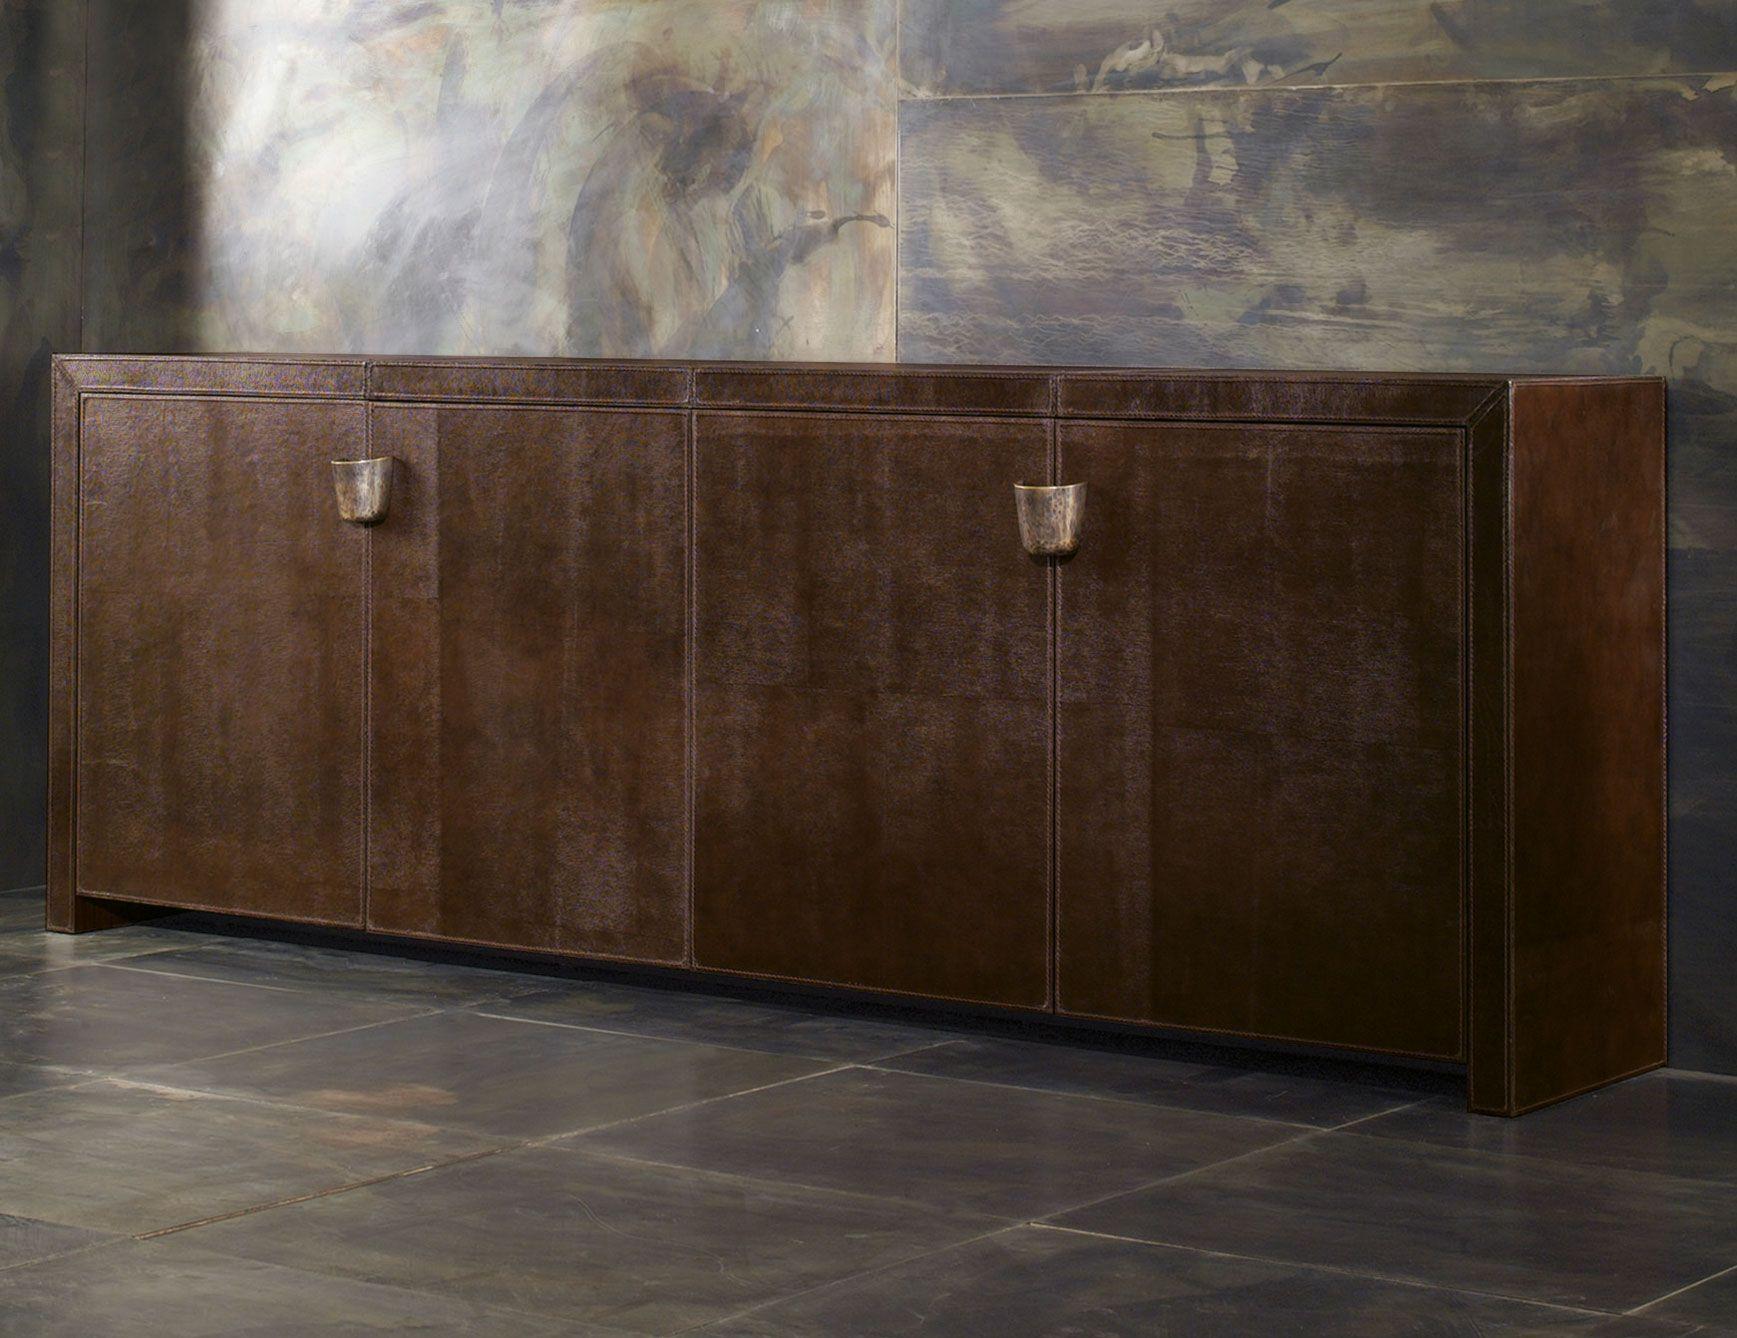 Shiroma 6007 Big Luxury Italian Sideboard Upholstered In Brown